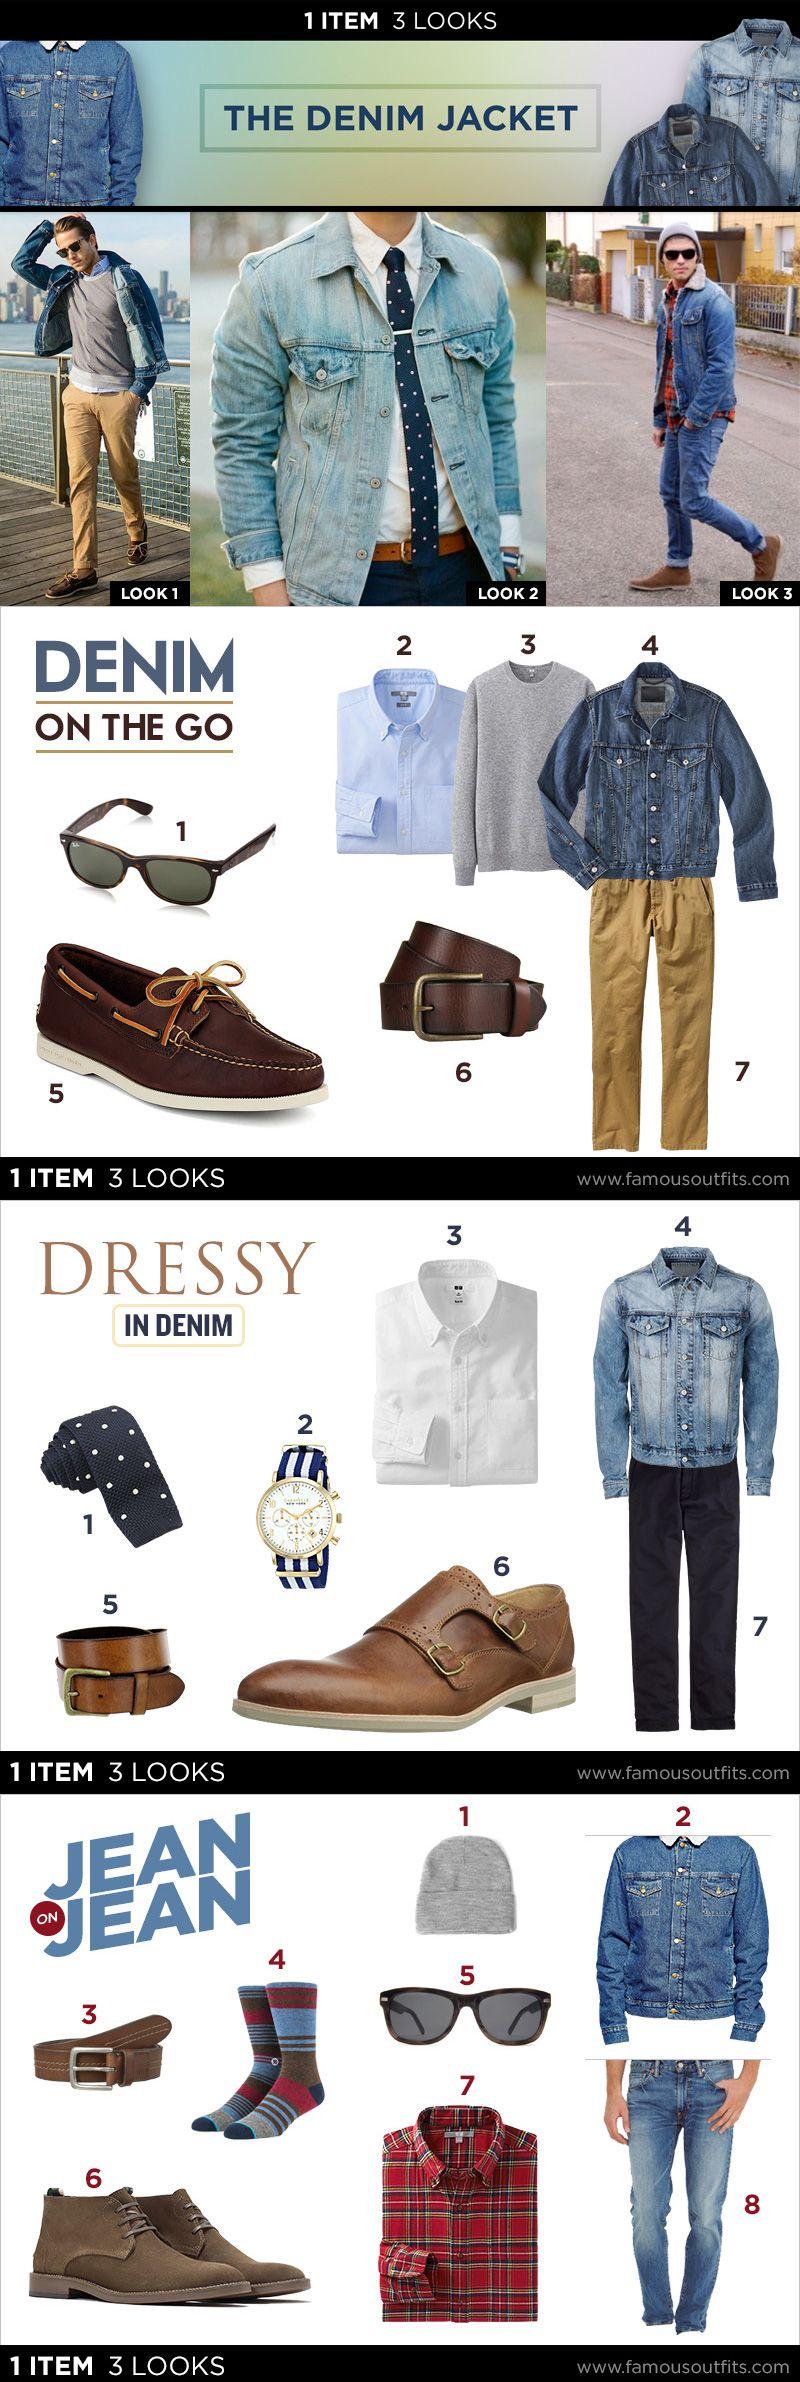 Denim Jacket 1 Item 3 Looks Denim Jacket Styles